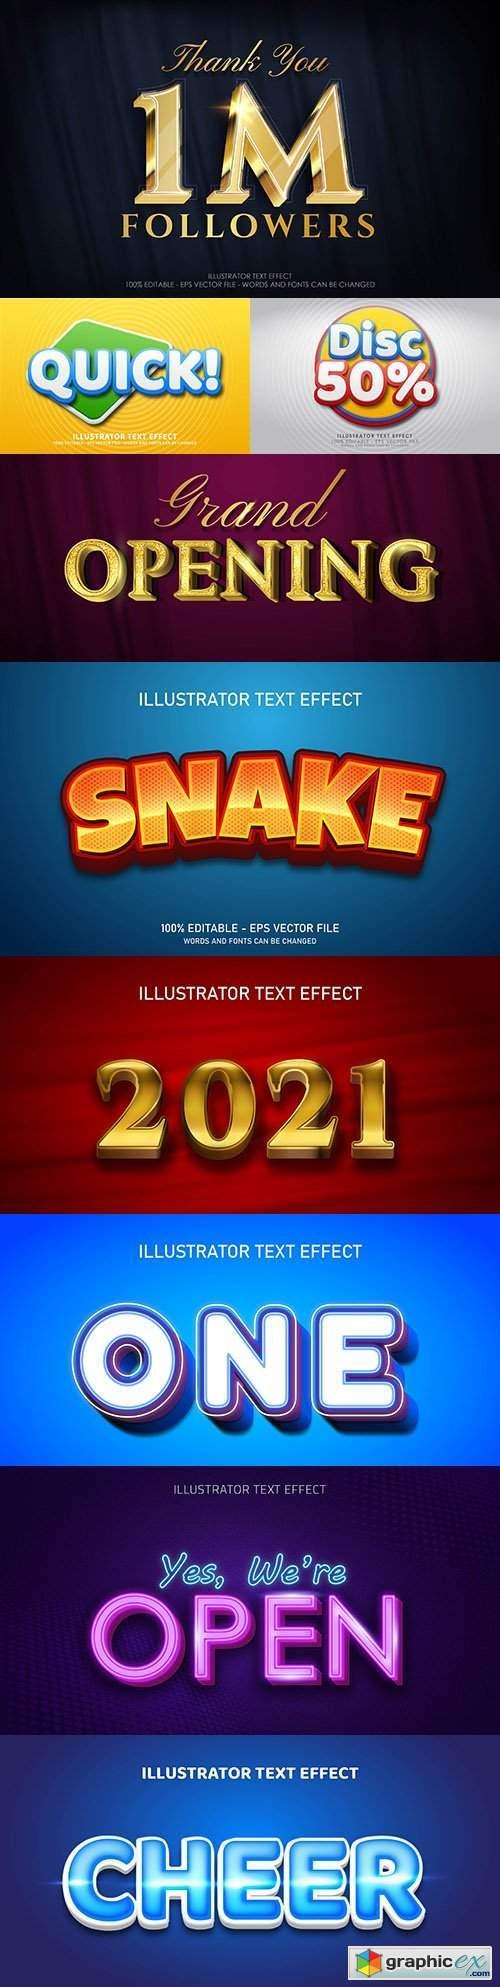 Editable font effect text collection illustration design 171